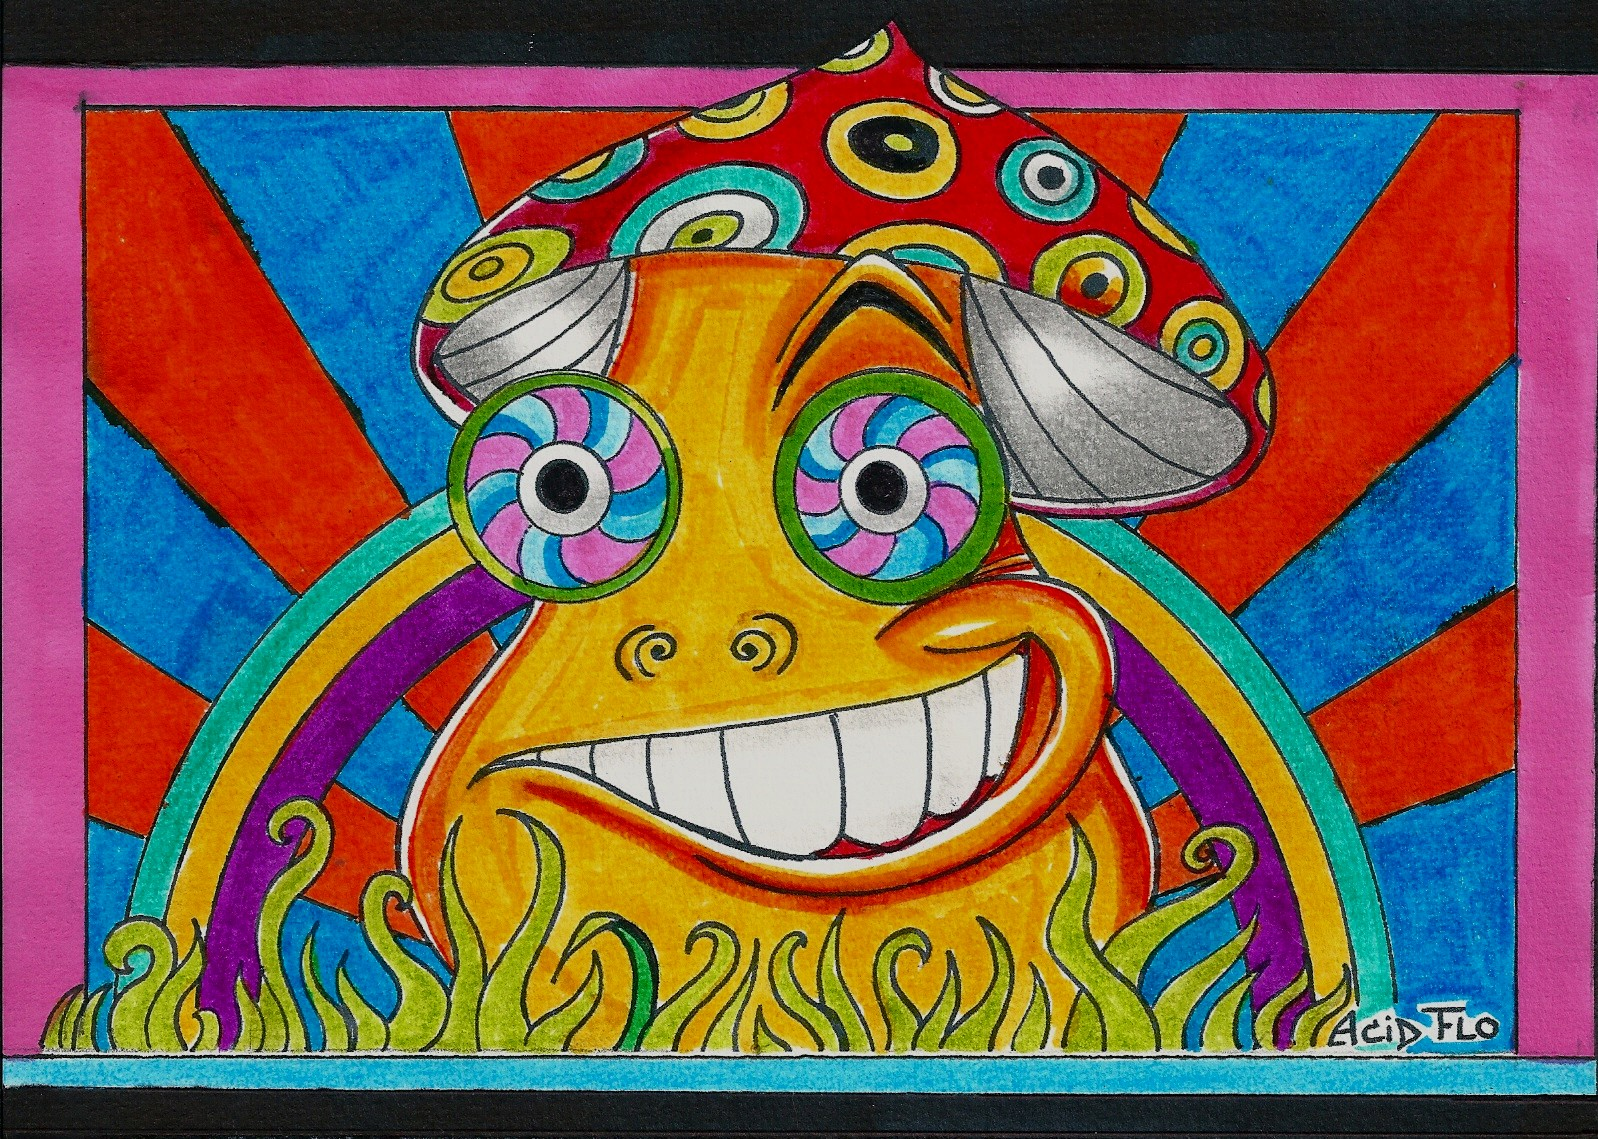 1598x1139 Happy Shroom By Acid Flo